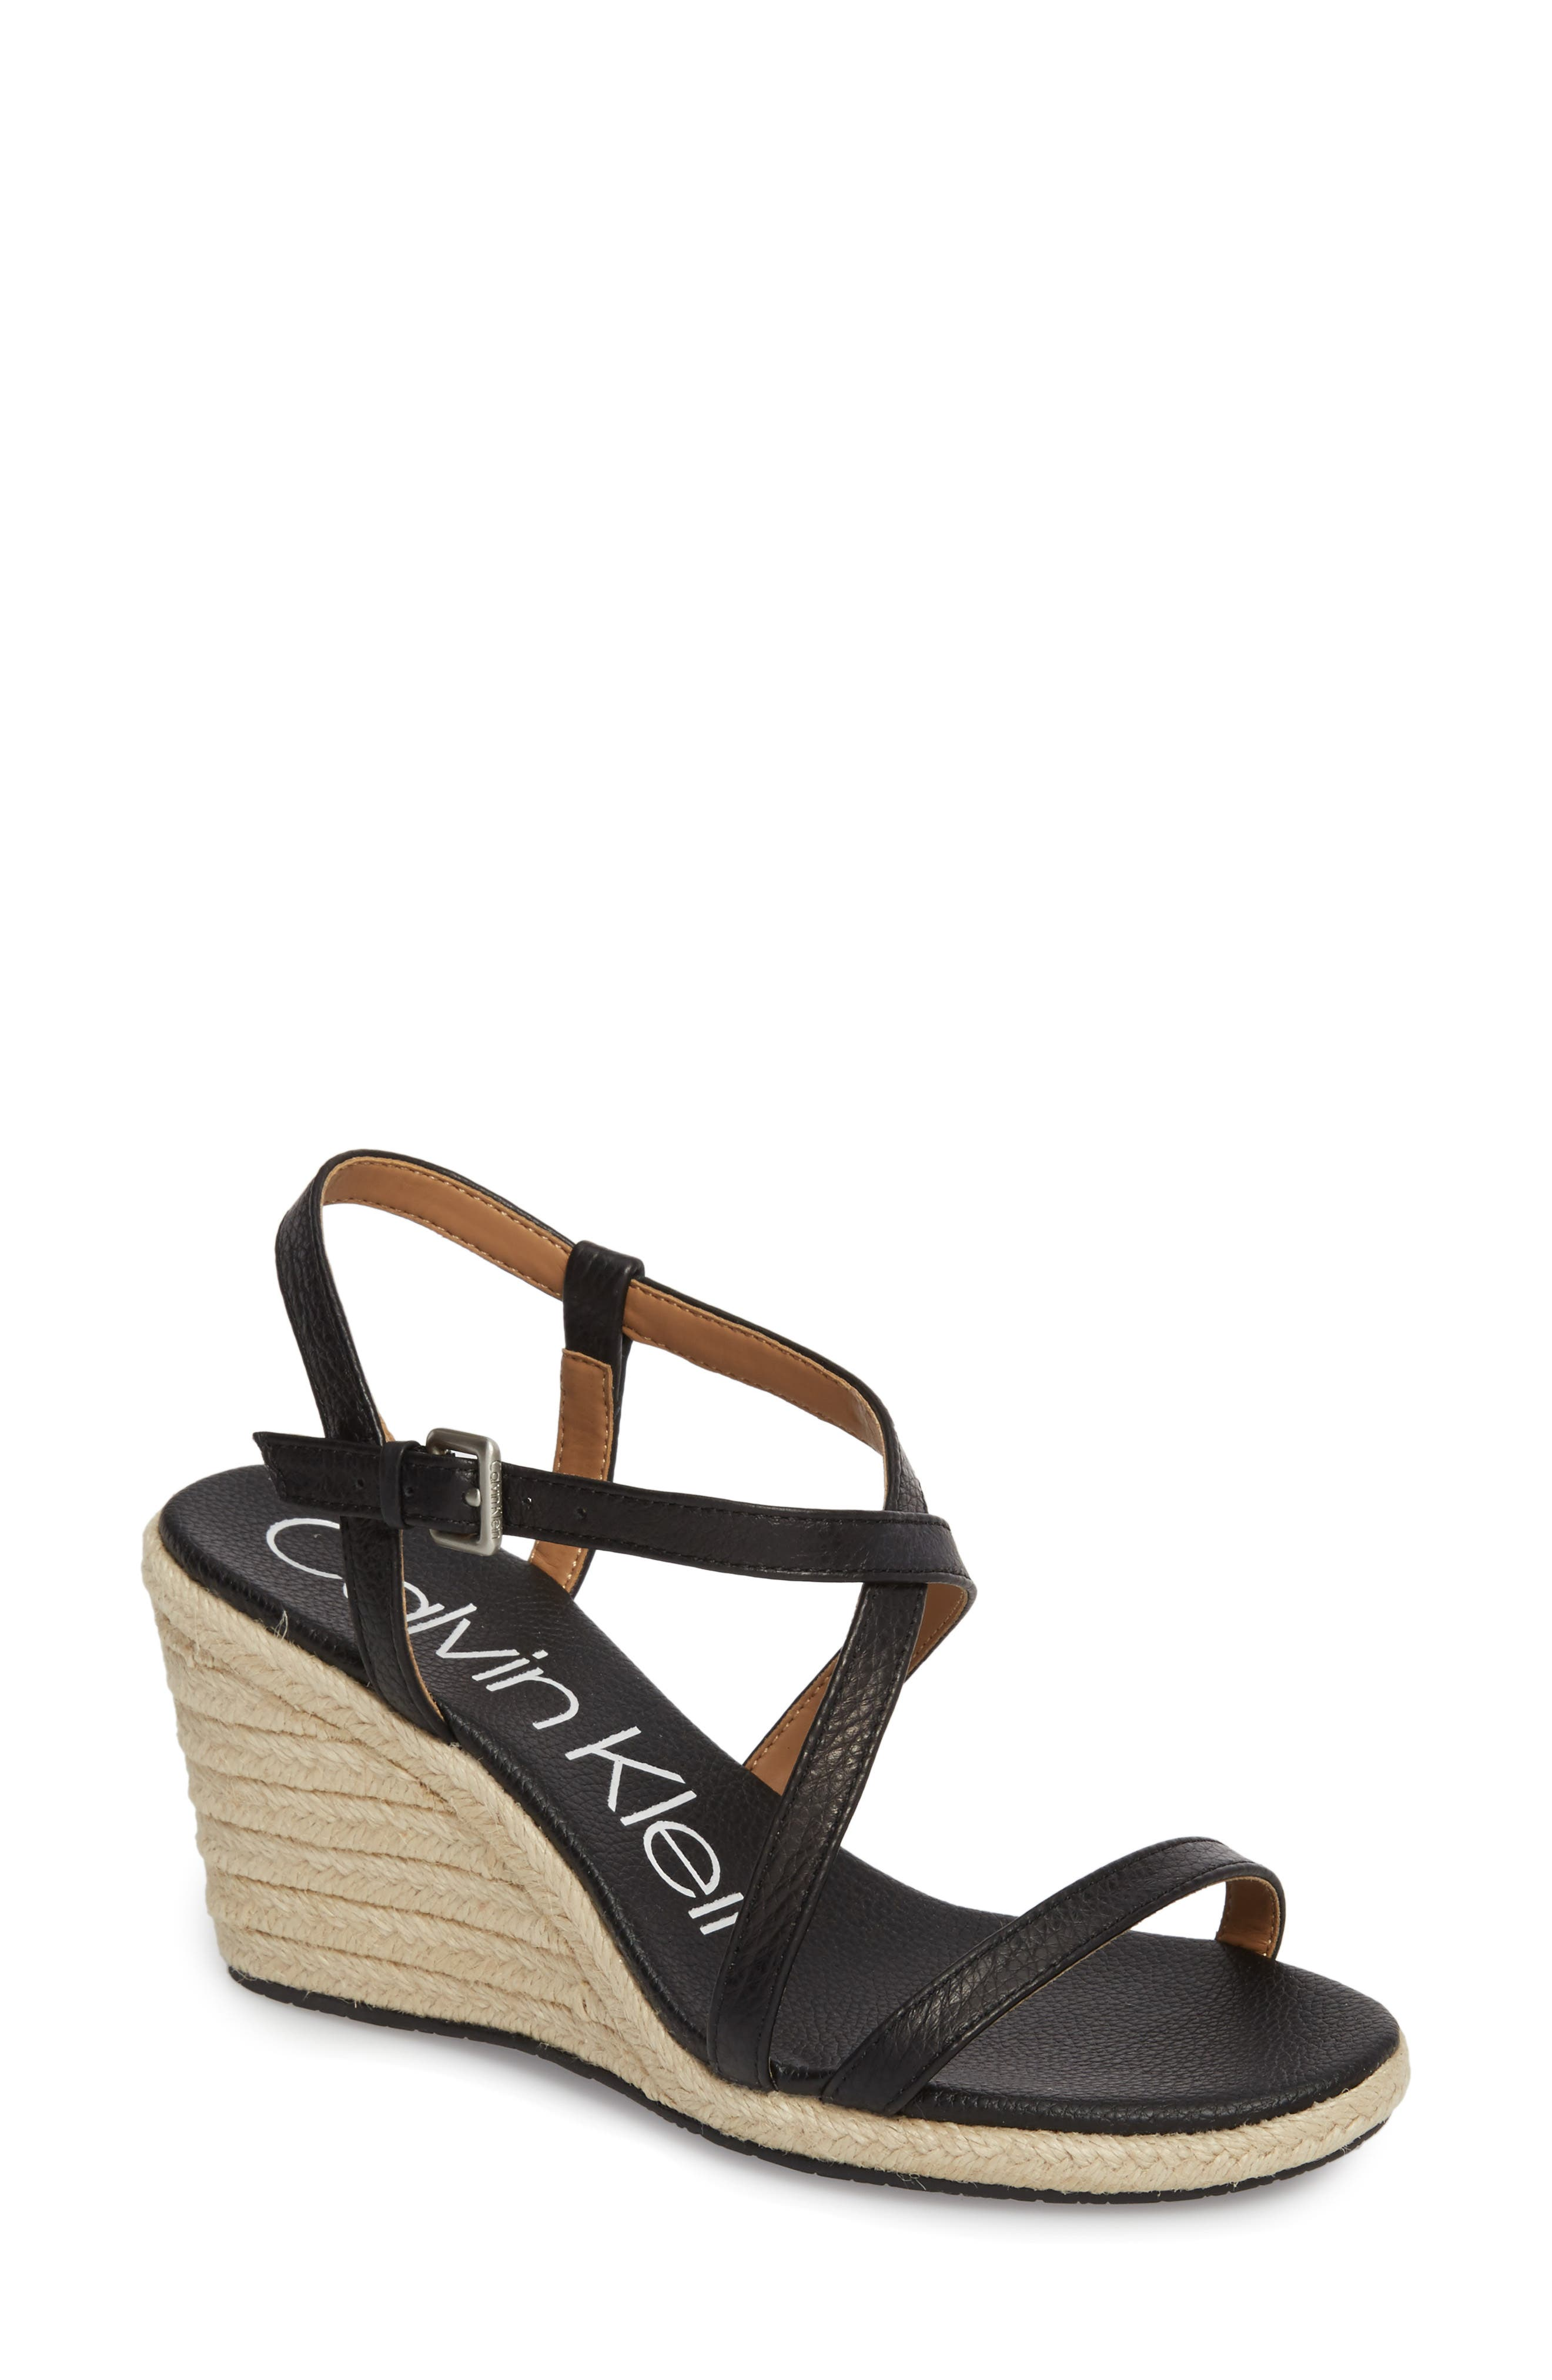 34a1a6b84c Calvin Klein Bellemine Espadrille Wedge Sandal- Black